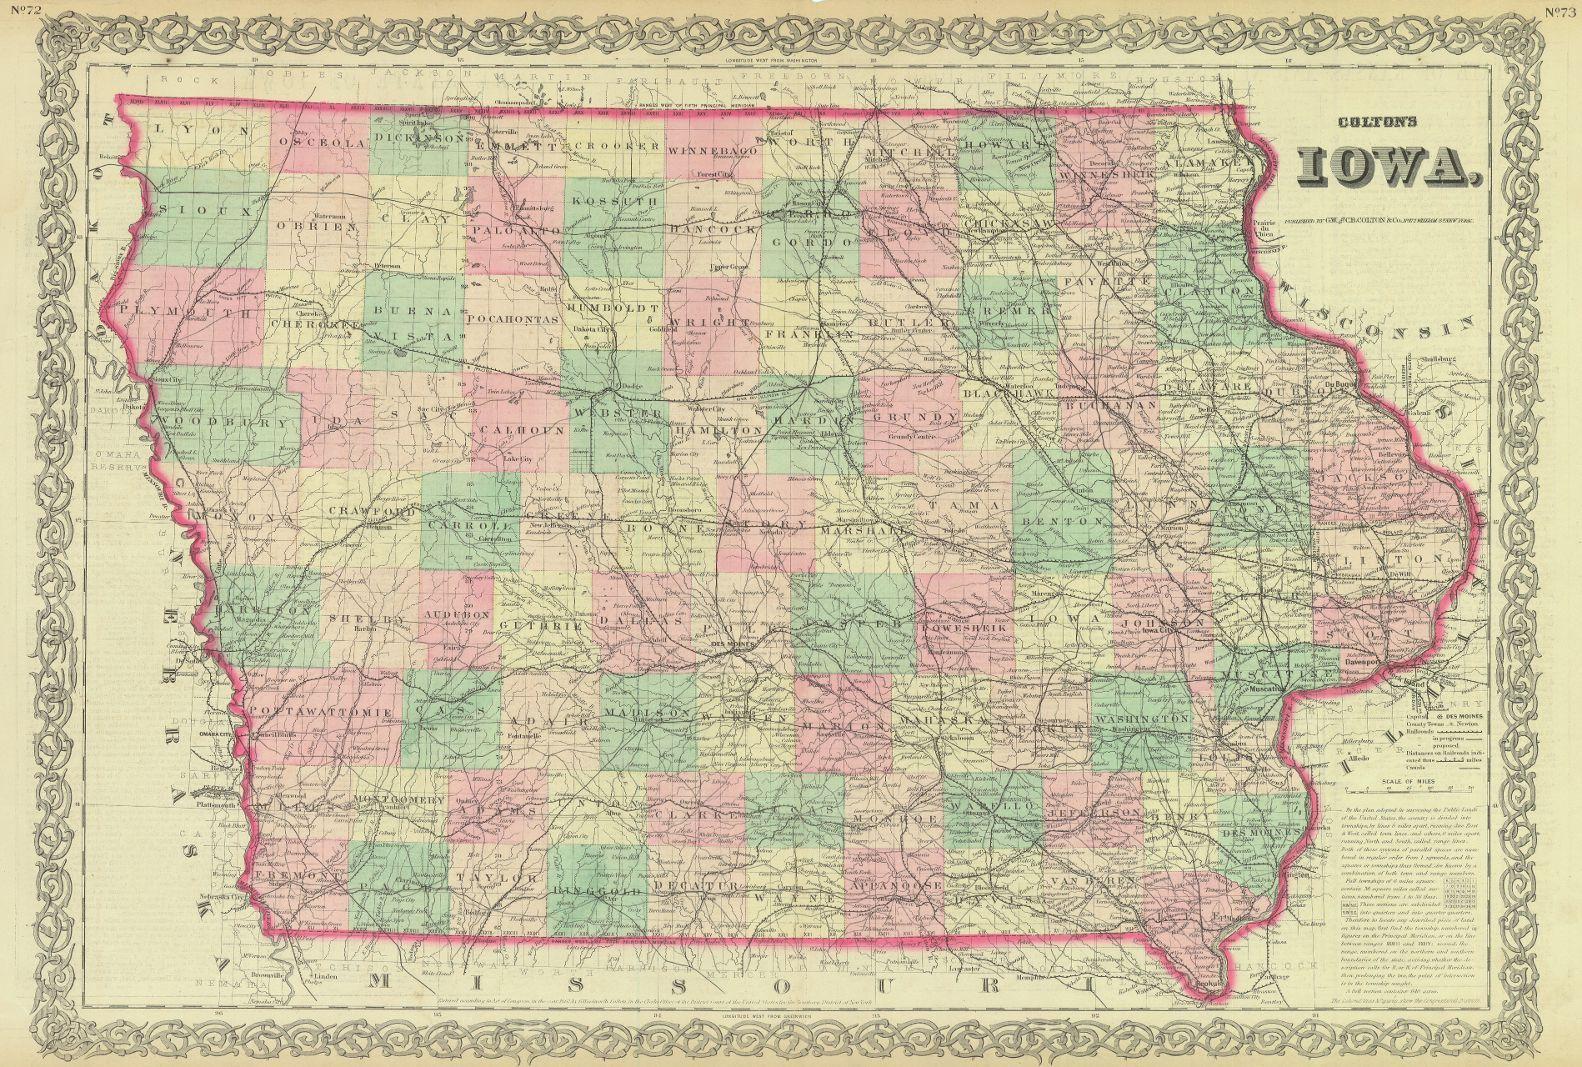 Map Antique Colton S Iowa G W C B Colton Co C1862 New